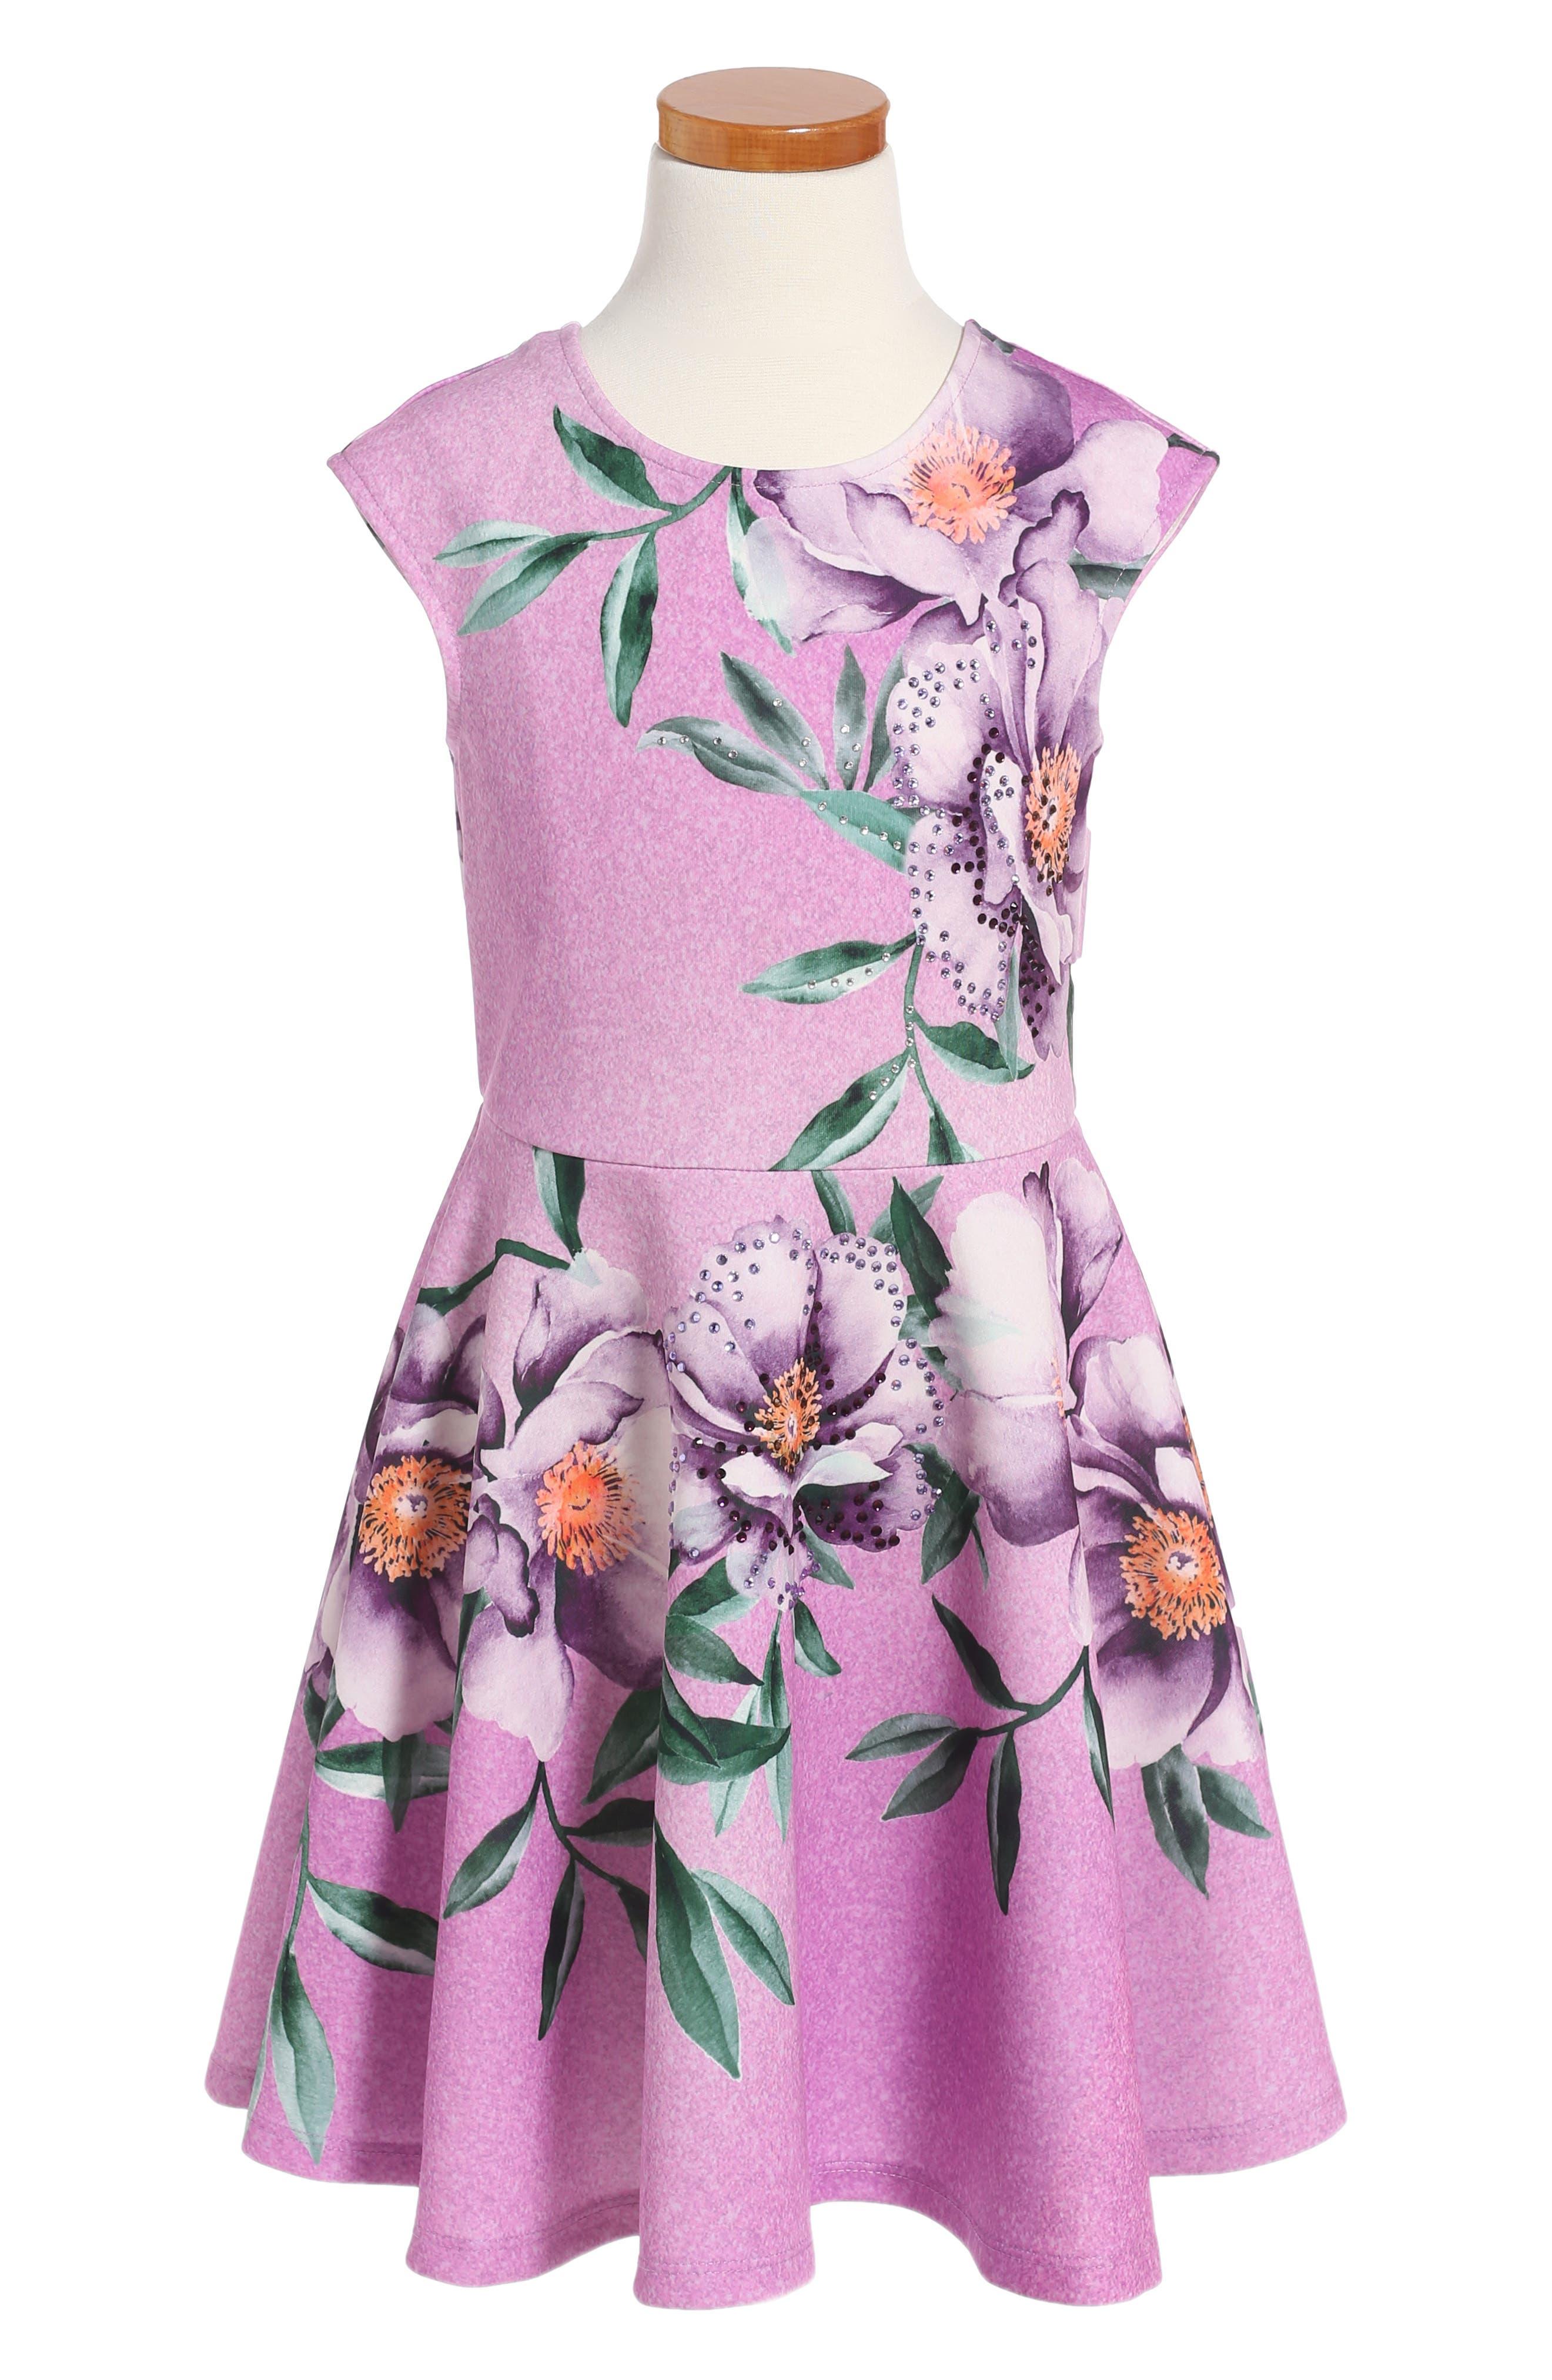 Floral Print Skater Dress,                             Main thumbnail 1, color,                             Lavender